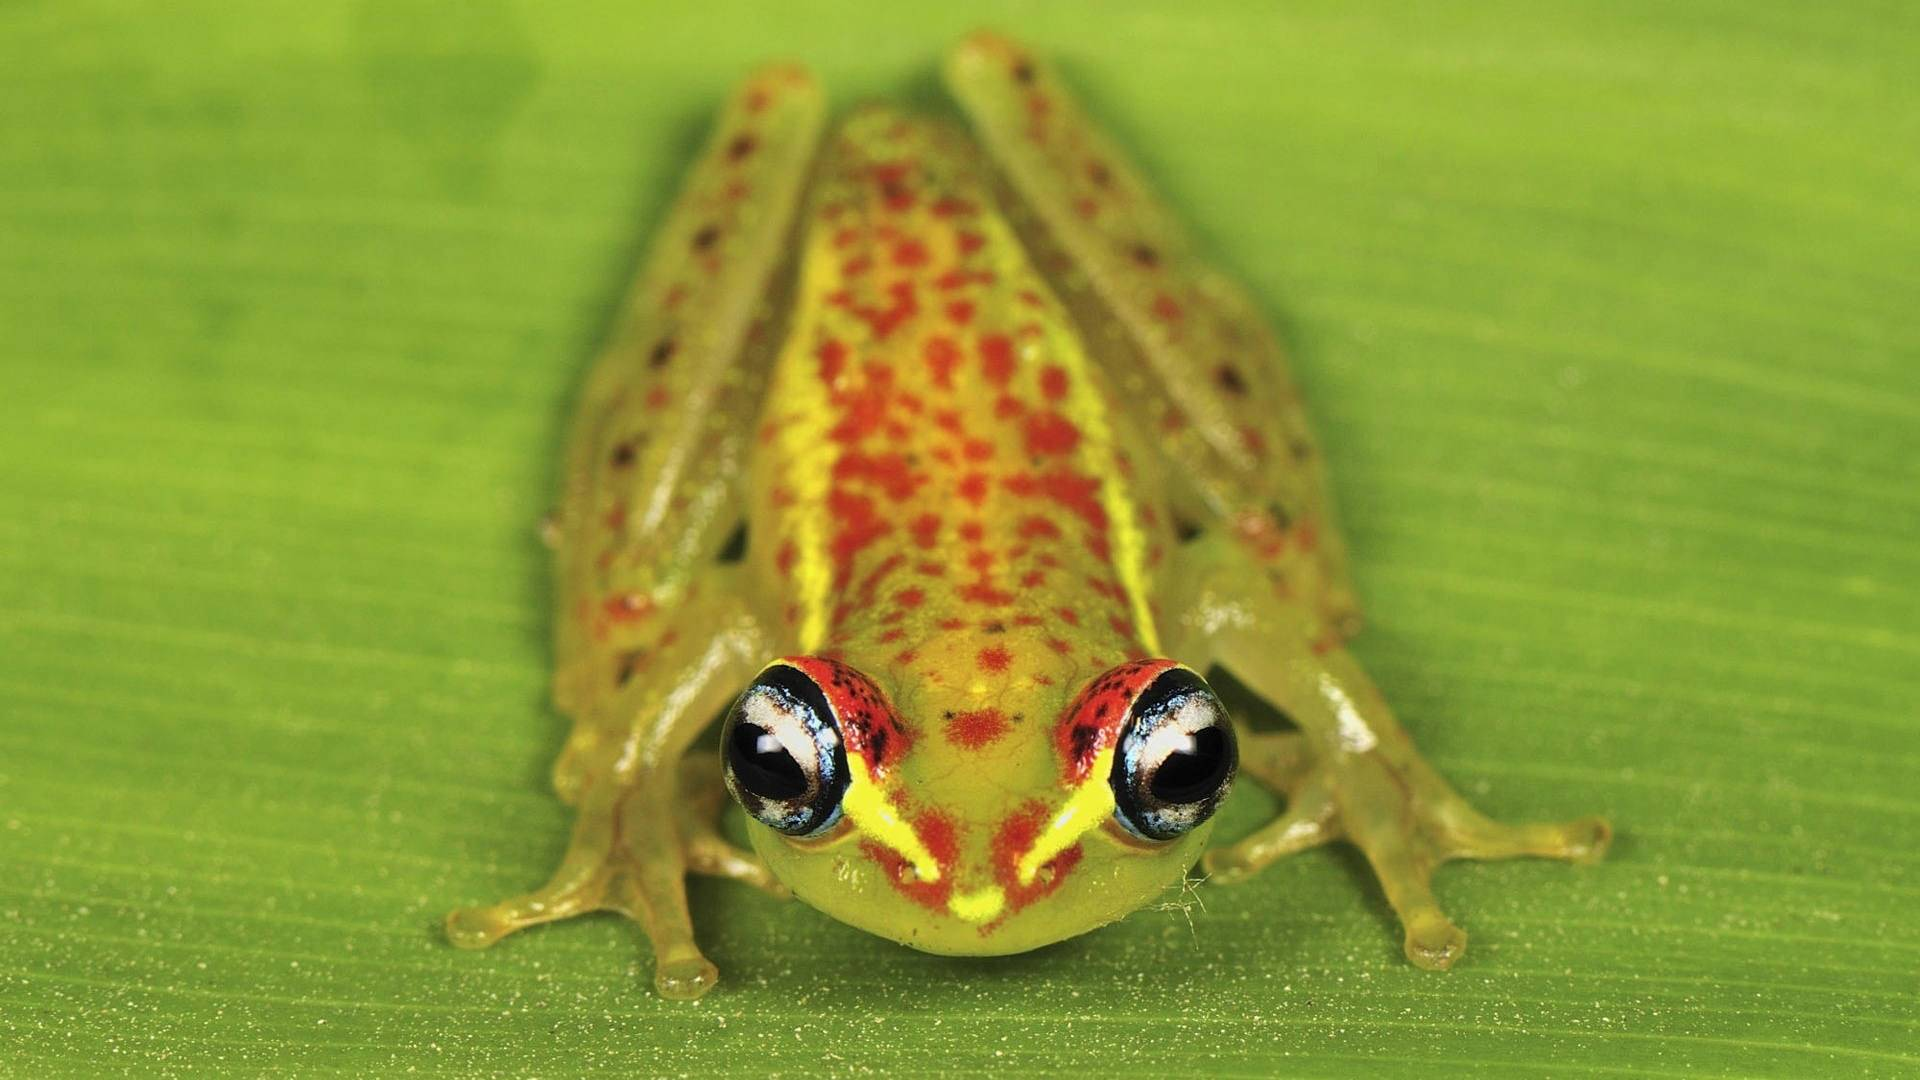 frog hd wallpapers